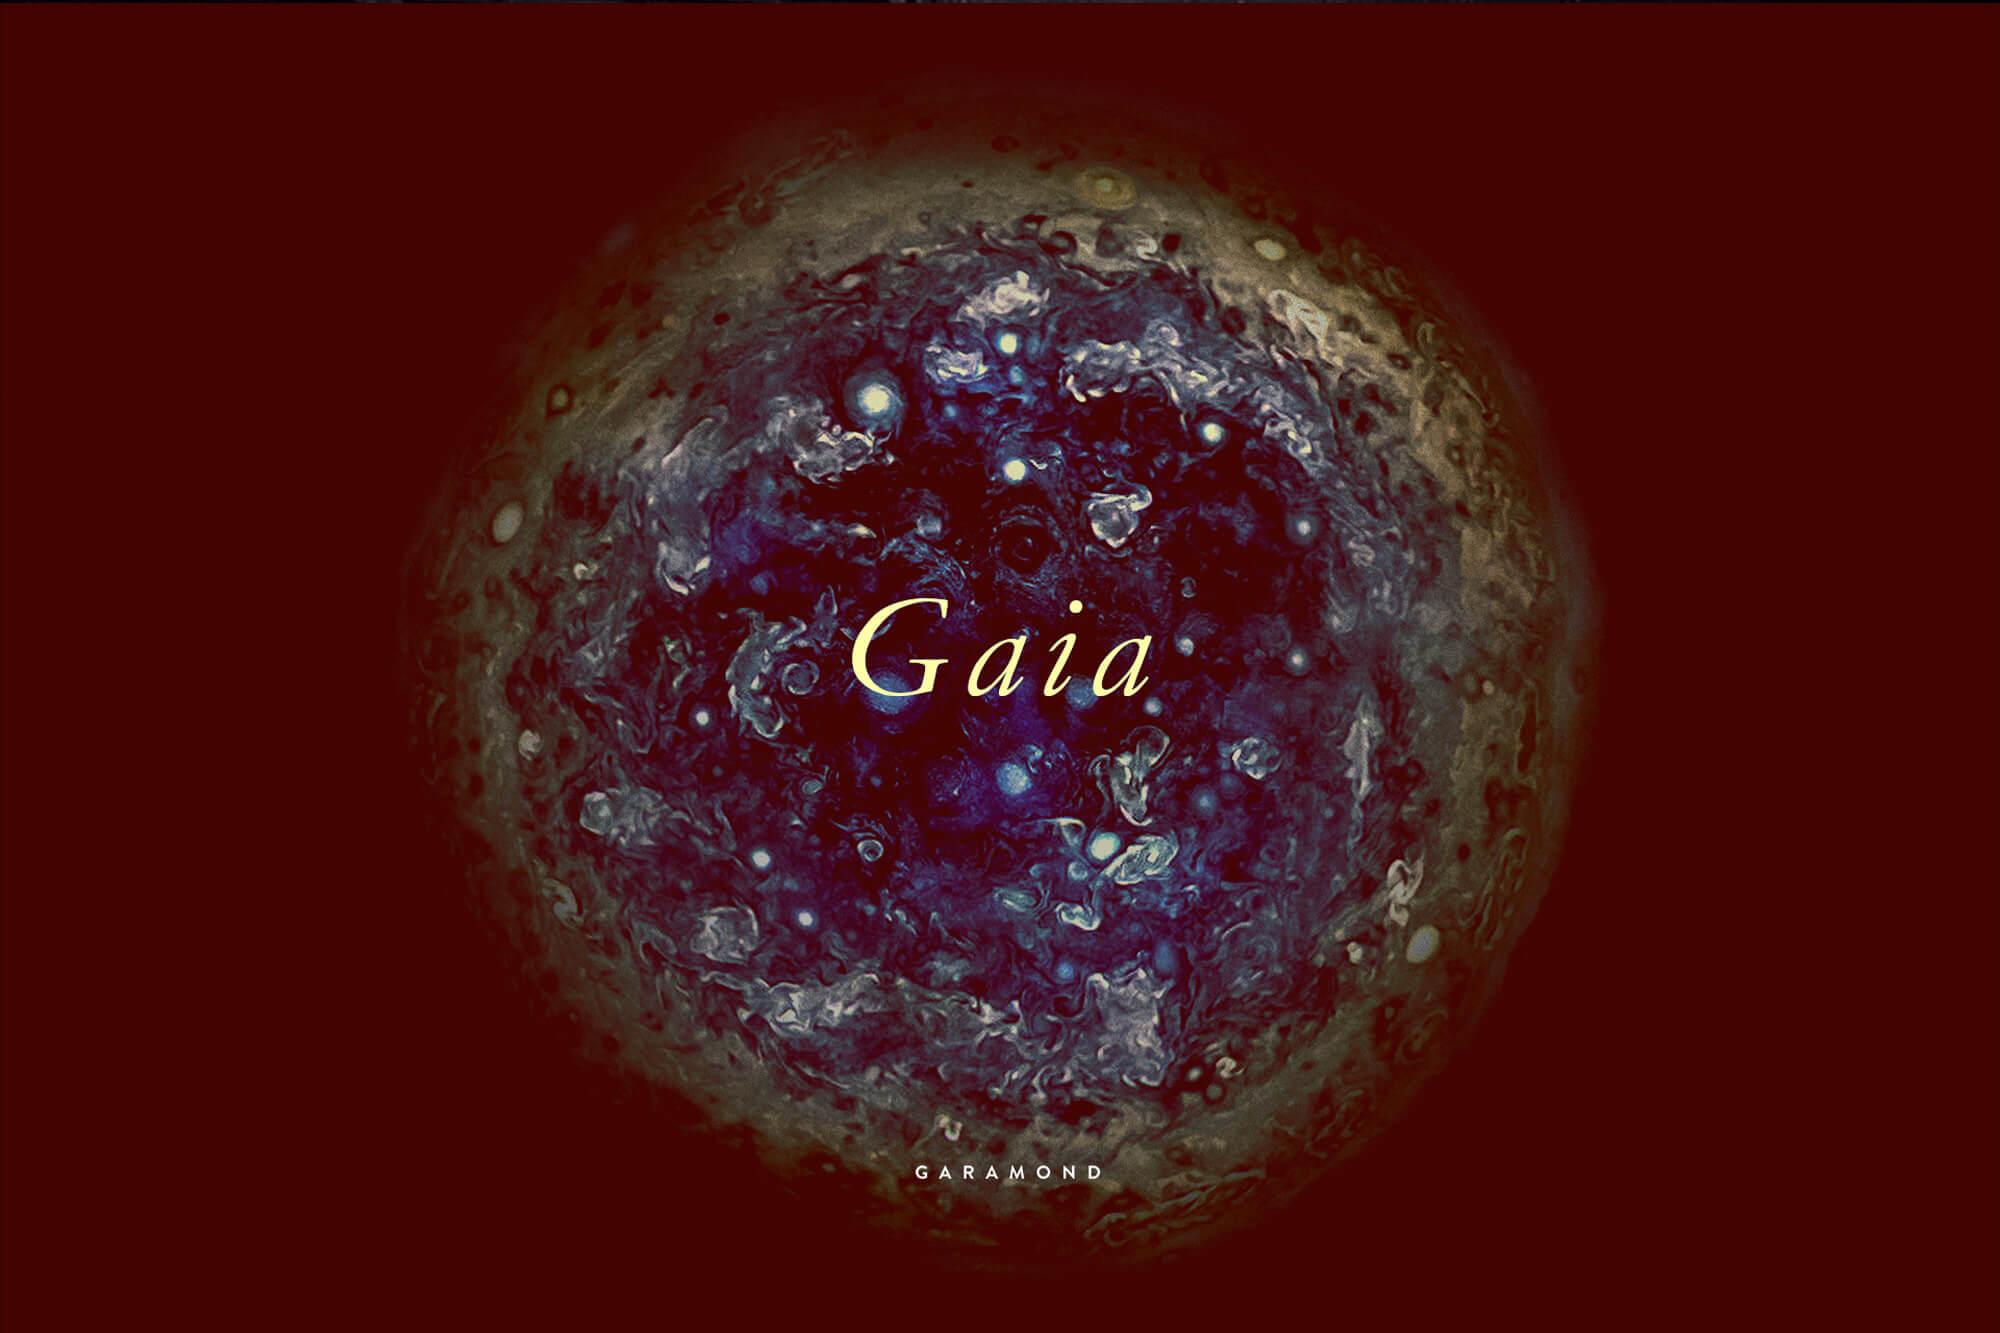 gareth-paul-jones-studio-design-garamond-music-shards-of-light-ep-cs-07-Gaia